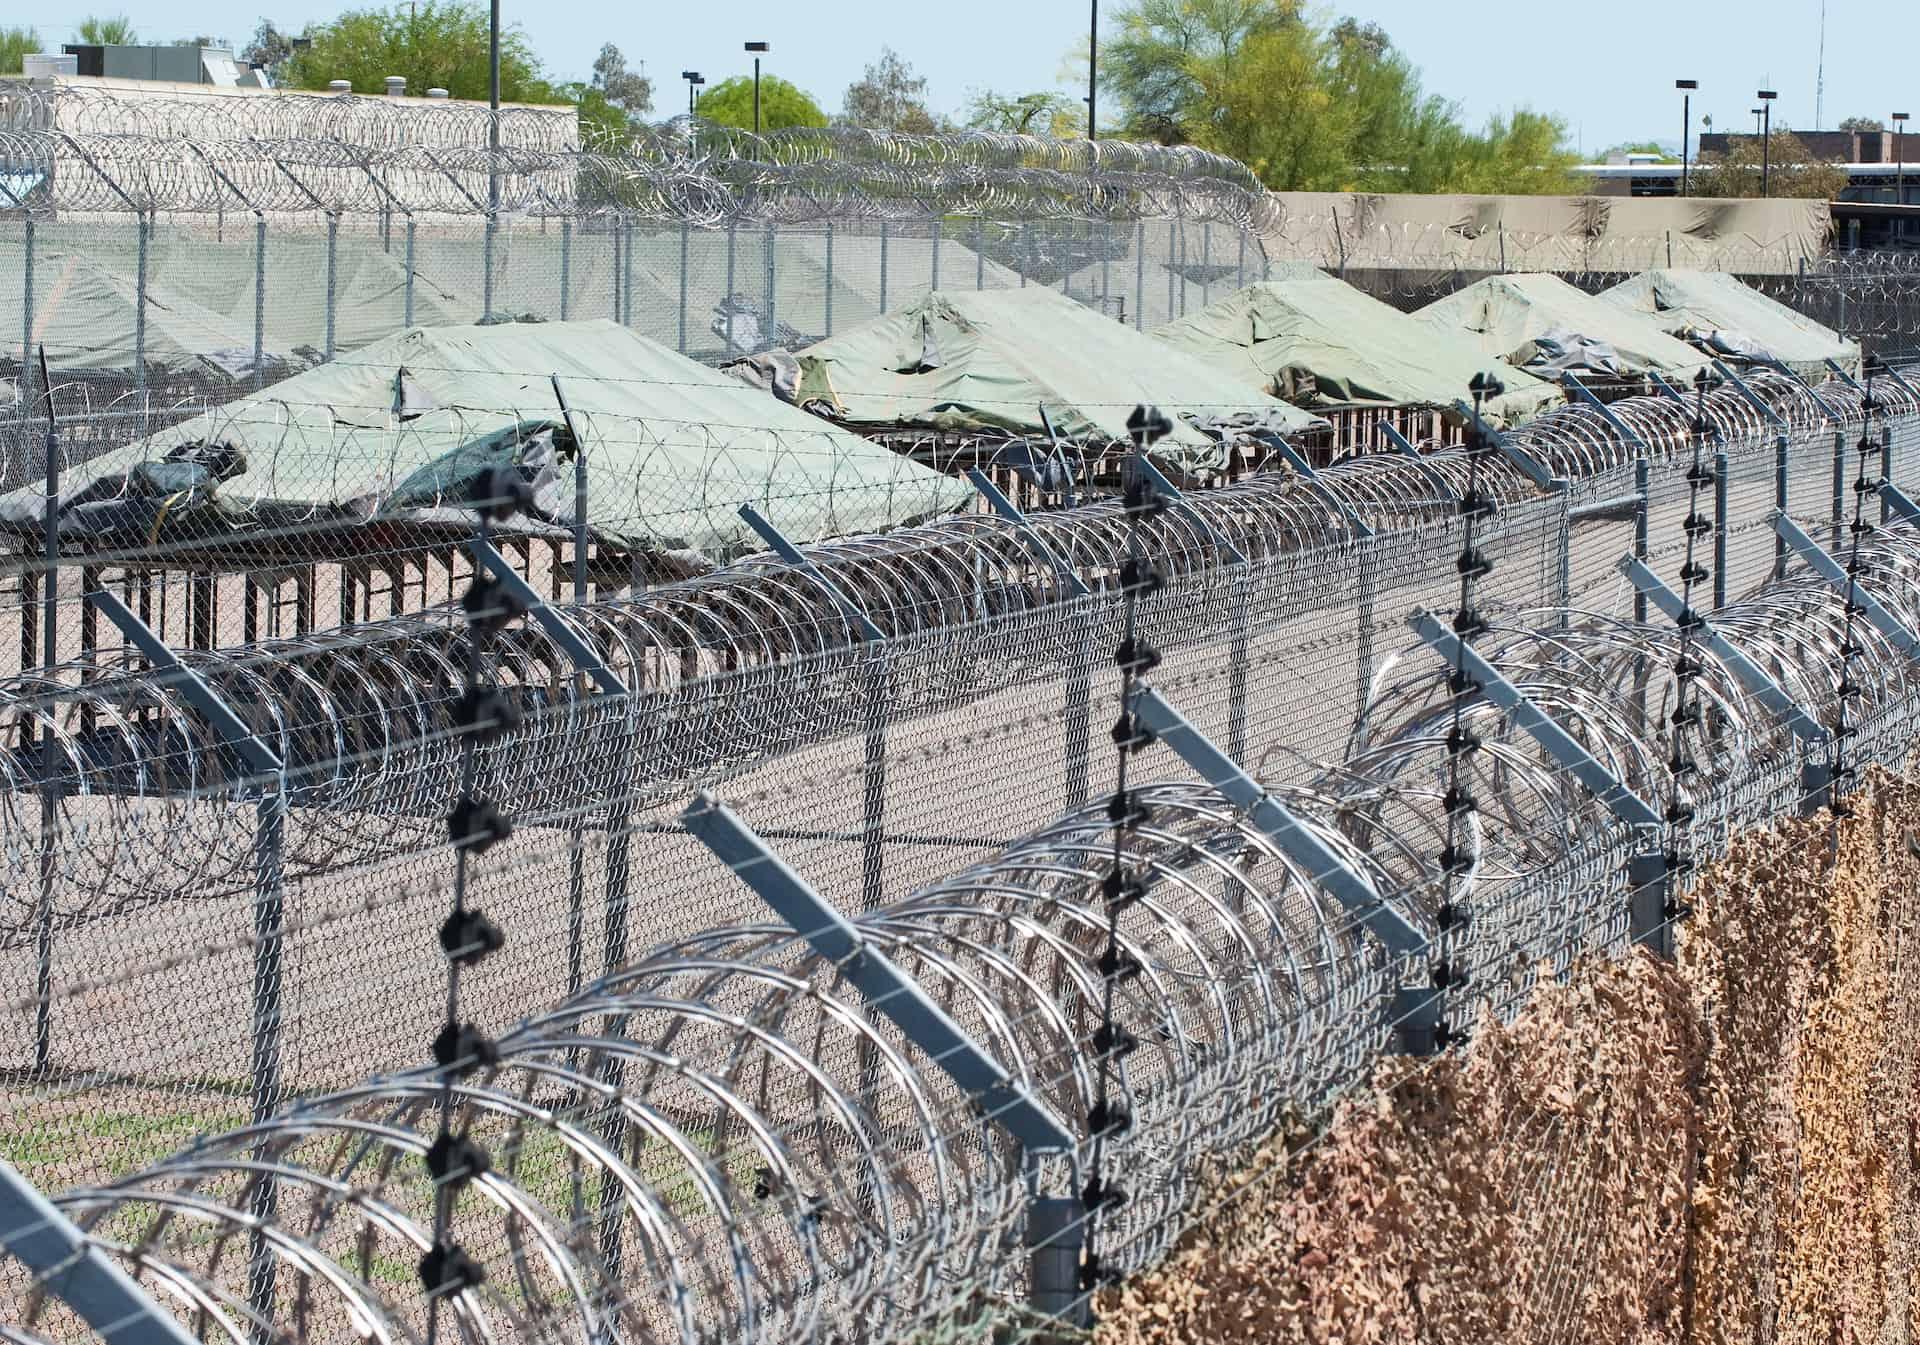 Tent City Jail June 2016 You & Tent Prison In The Arizona Desert - Best Tent 2018